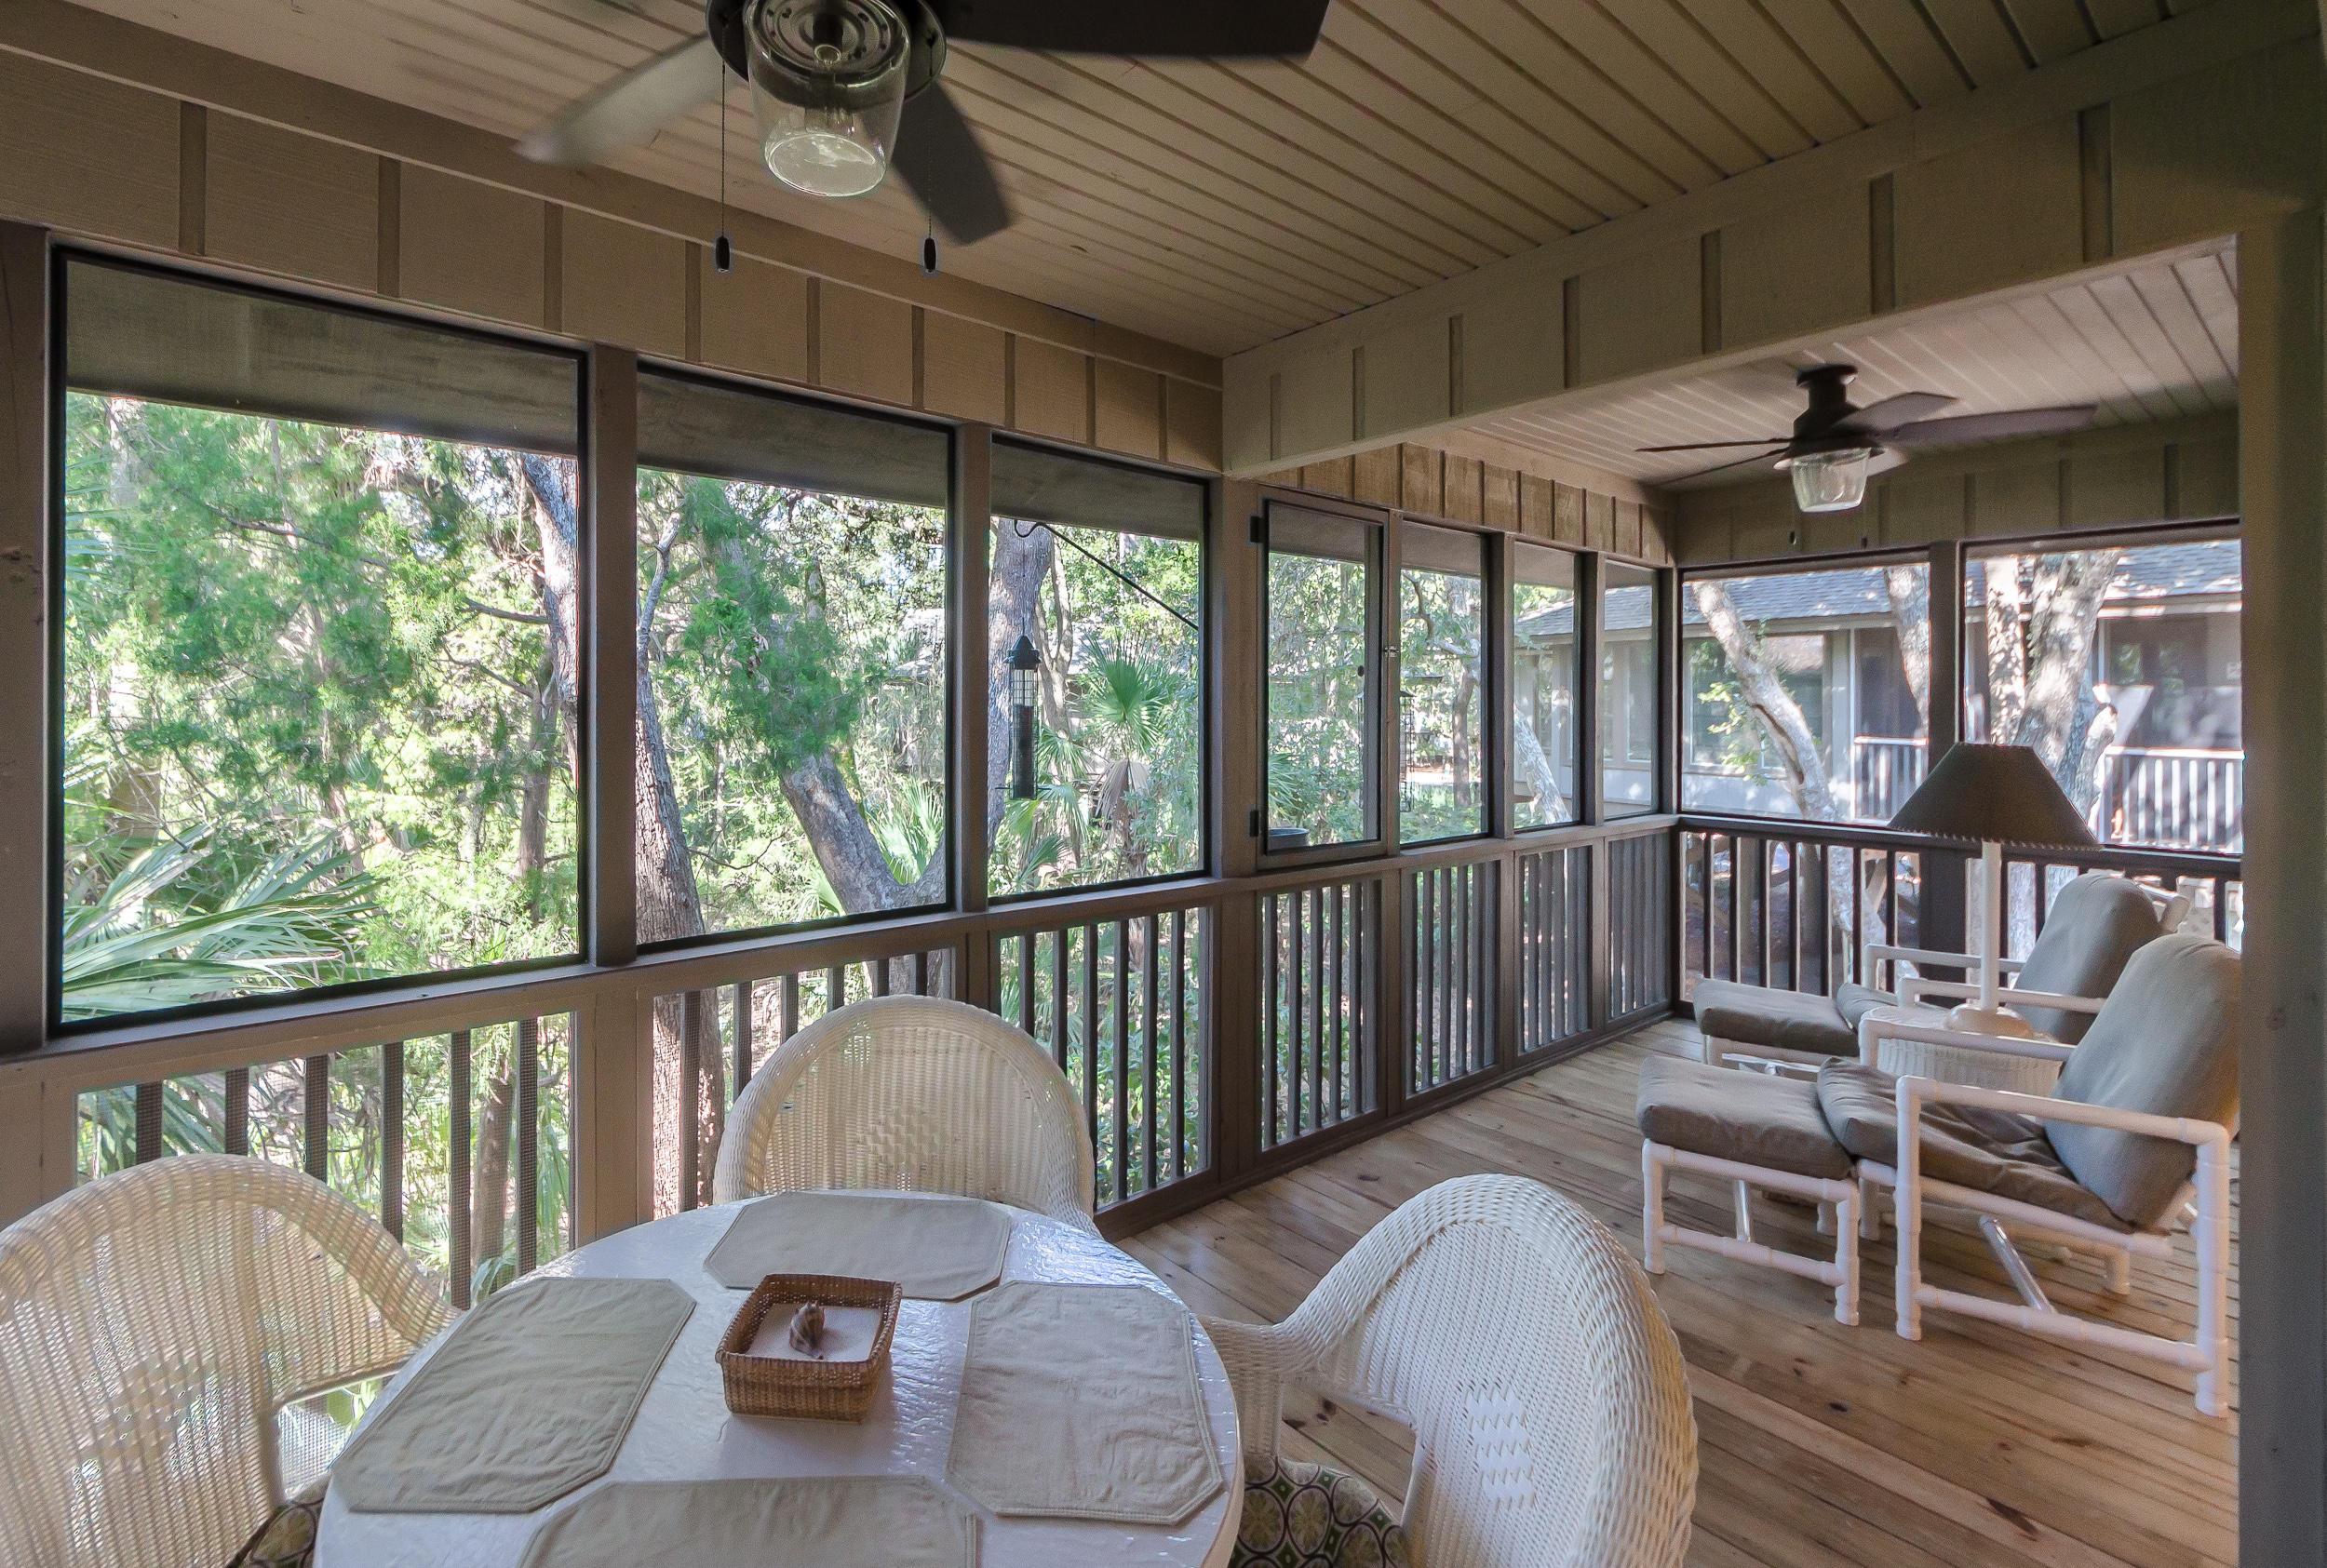 Kiawah Island Homes For Sale - 4186 Bald Pate, Kiawah Island, SC - 1